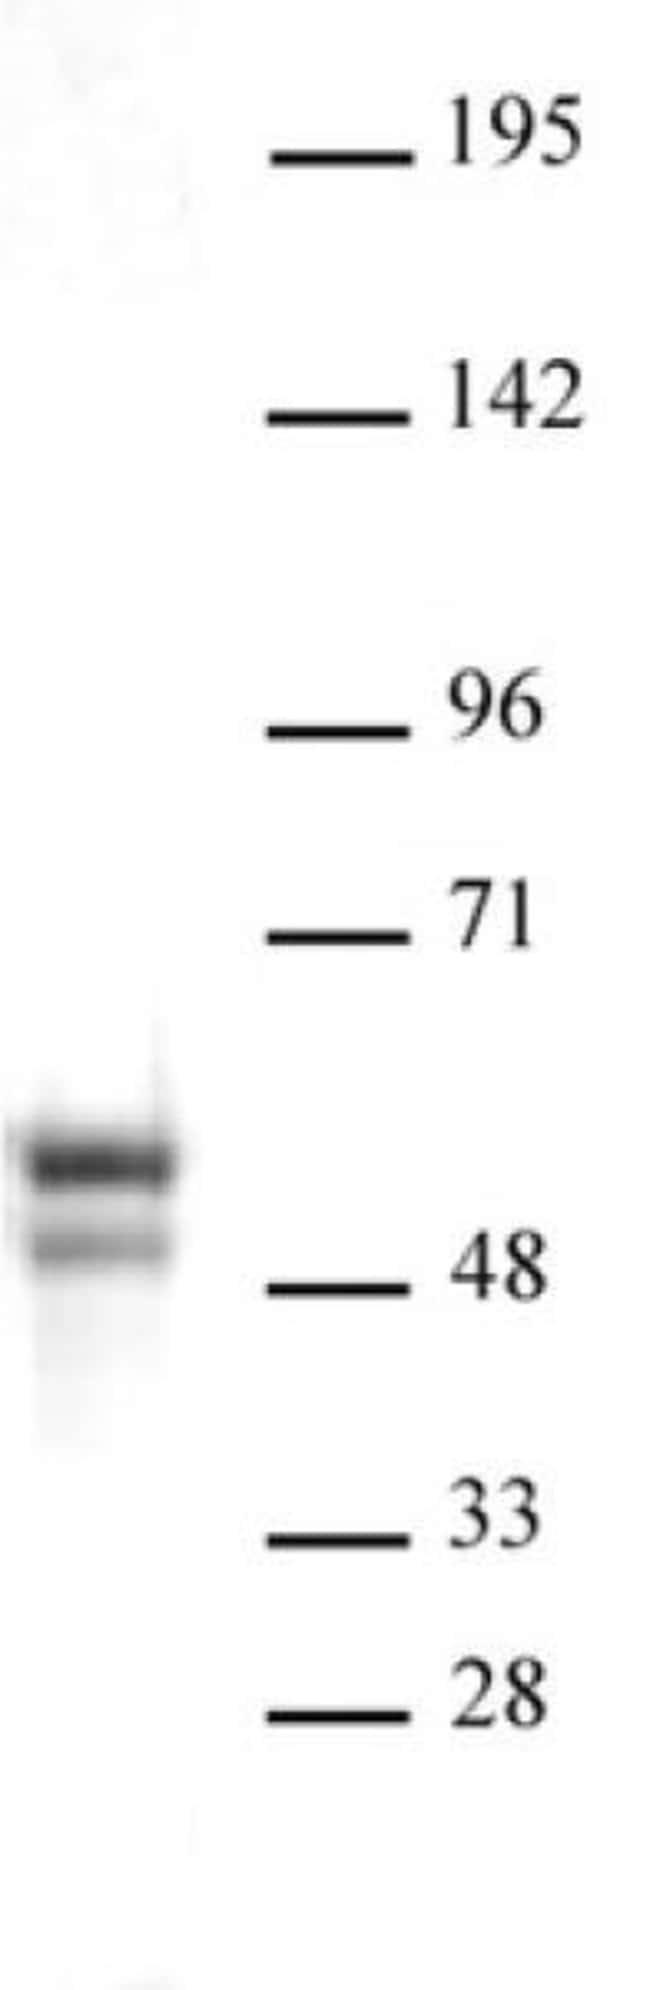 NAP1L1 Rabbit anti-Human, Unconjugated, Polyclonal, Active Motif:Antibodies:Primary